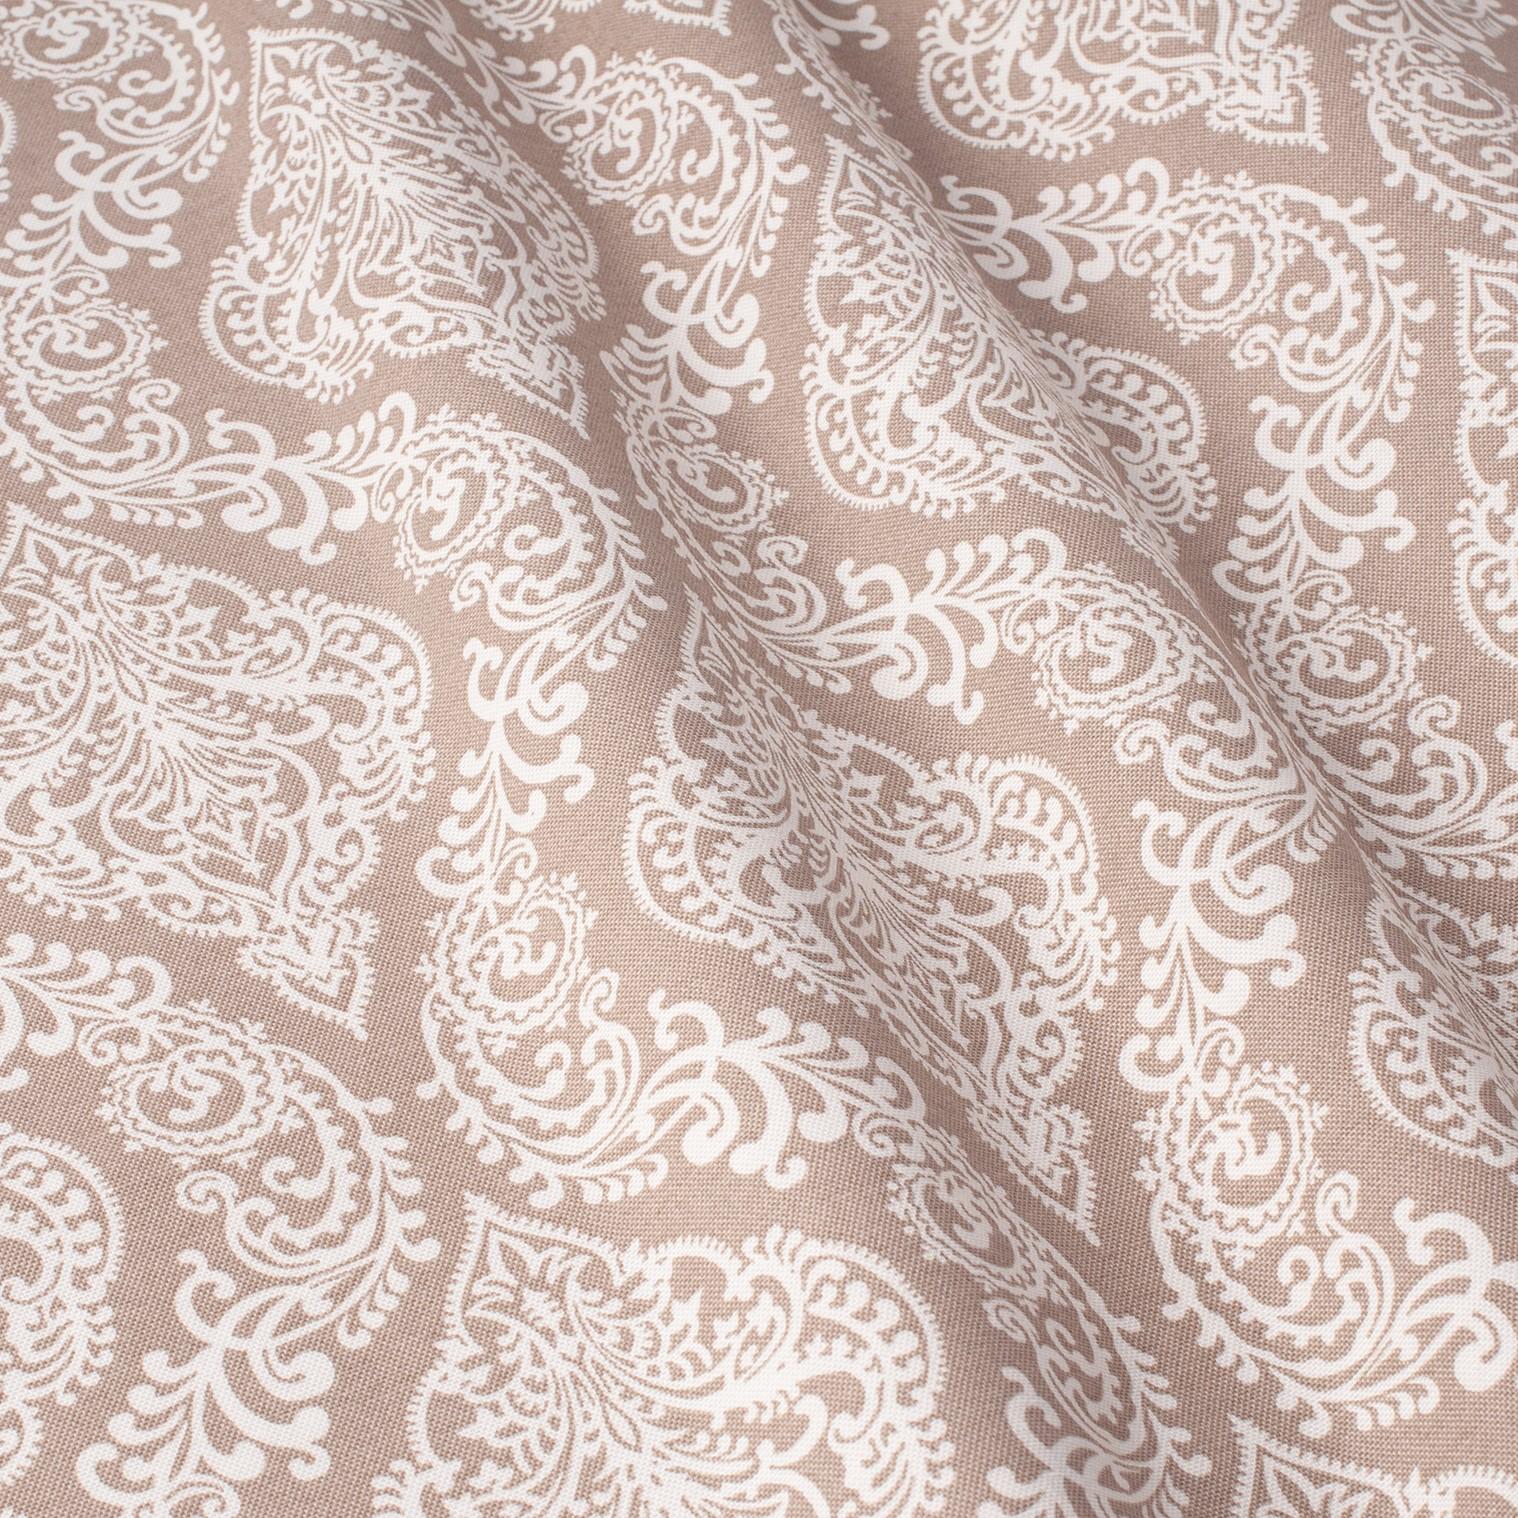 Mantel VICTORIAN BEIGE Rectangular 1,2x1,7m [porconfeccionar] [listoen5·7días]